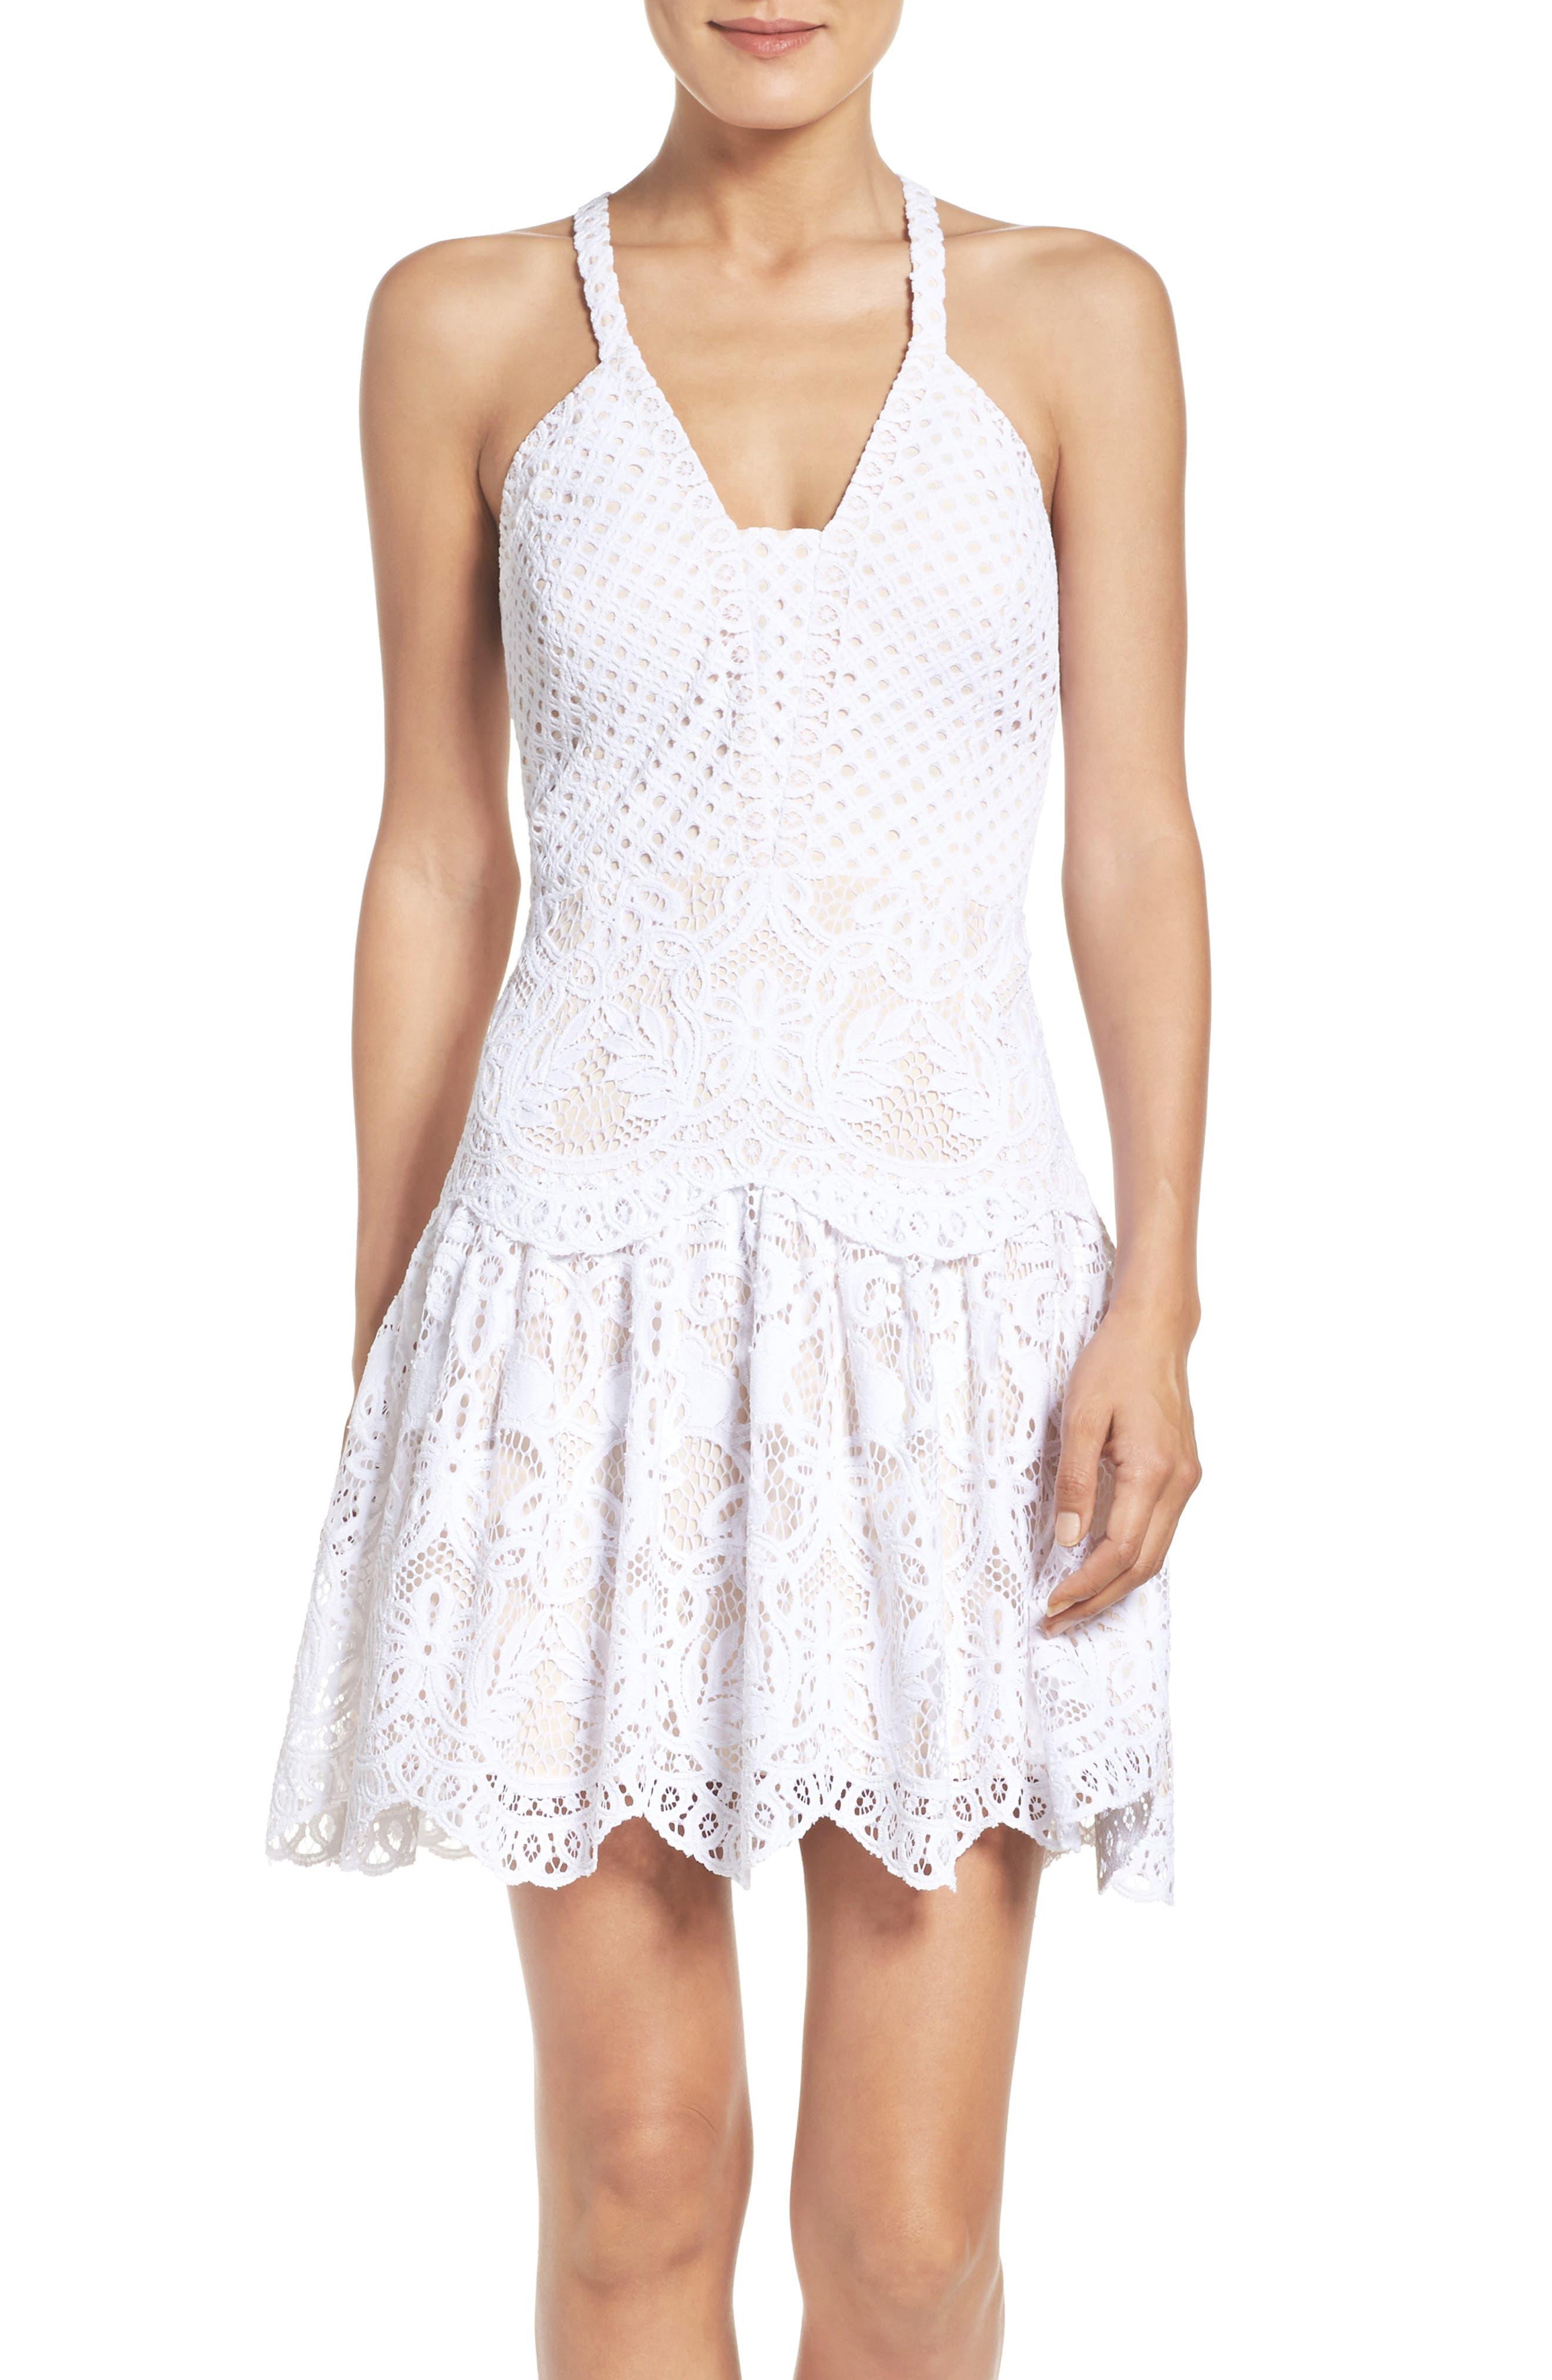 Main Image - Lilly Pulitzer® Adella Lace Dress